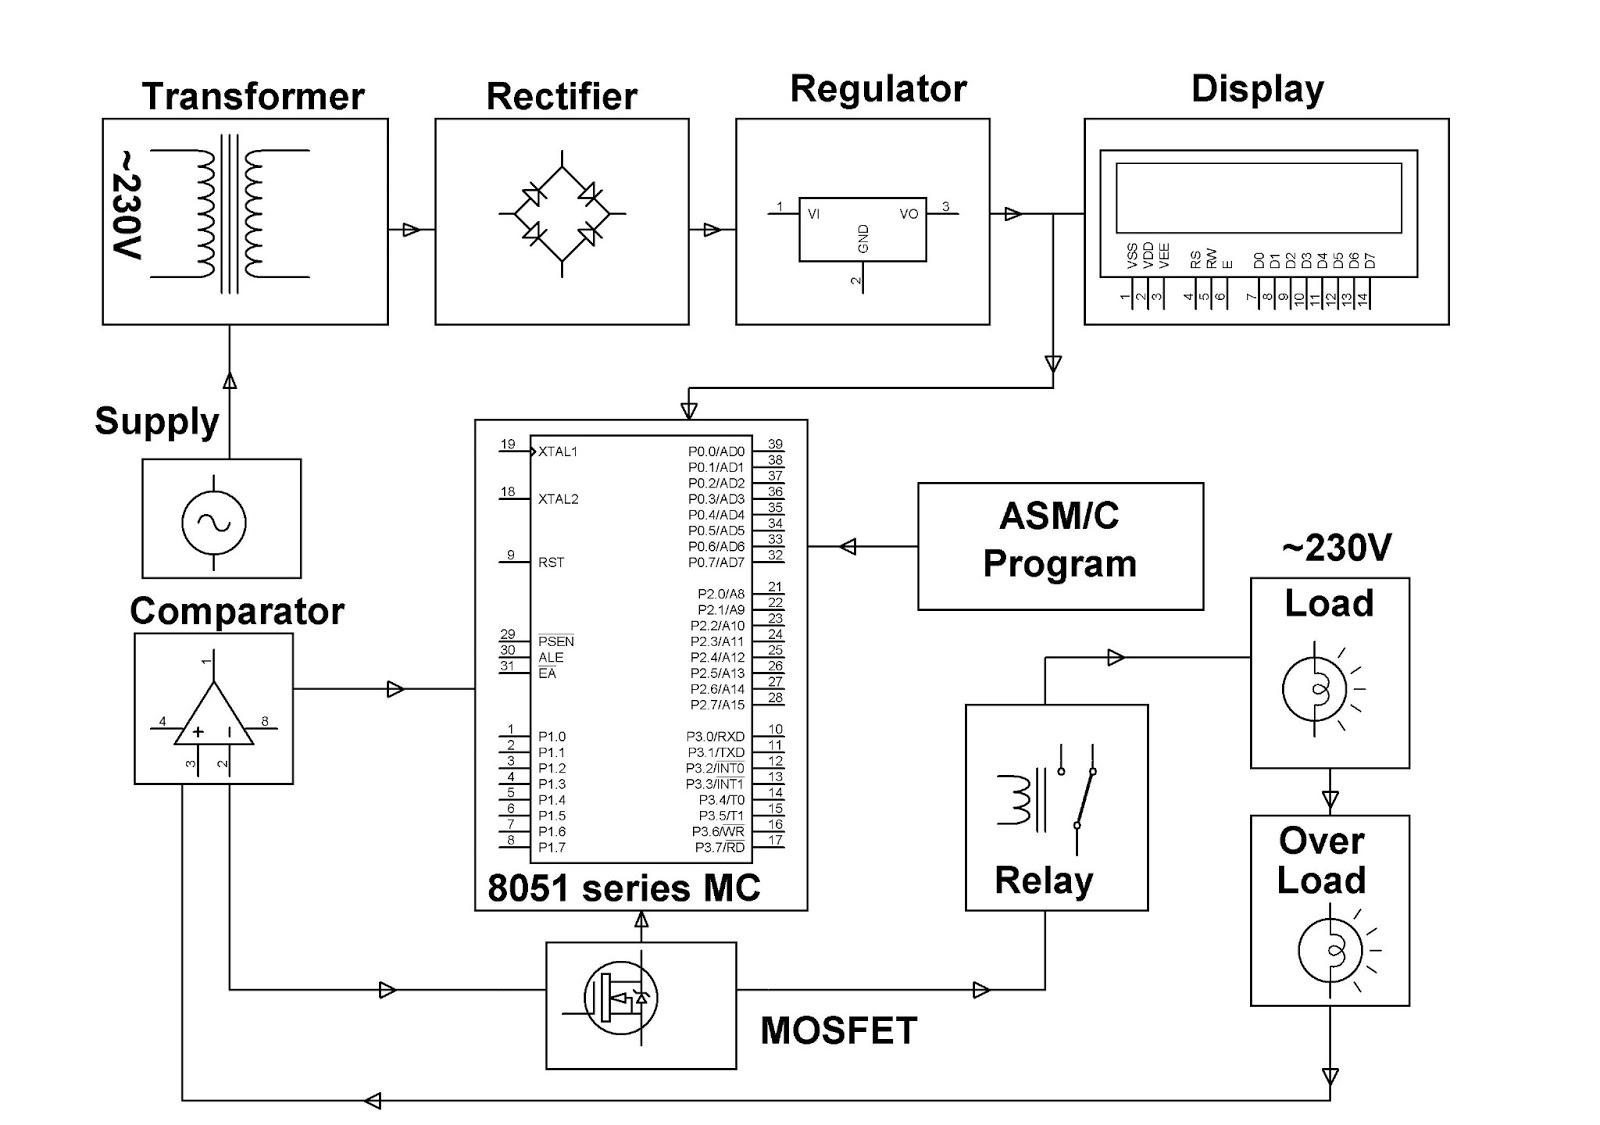 Crystal Radio Schematic Diagram Http Wwwcrystalradionet Misc